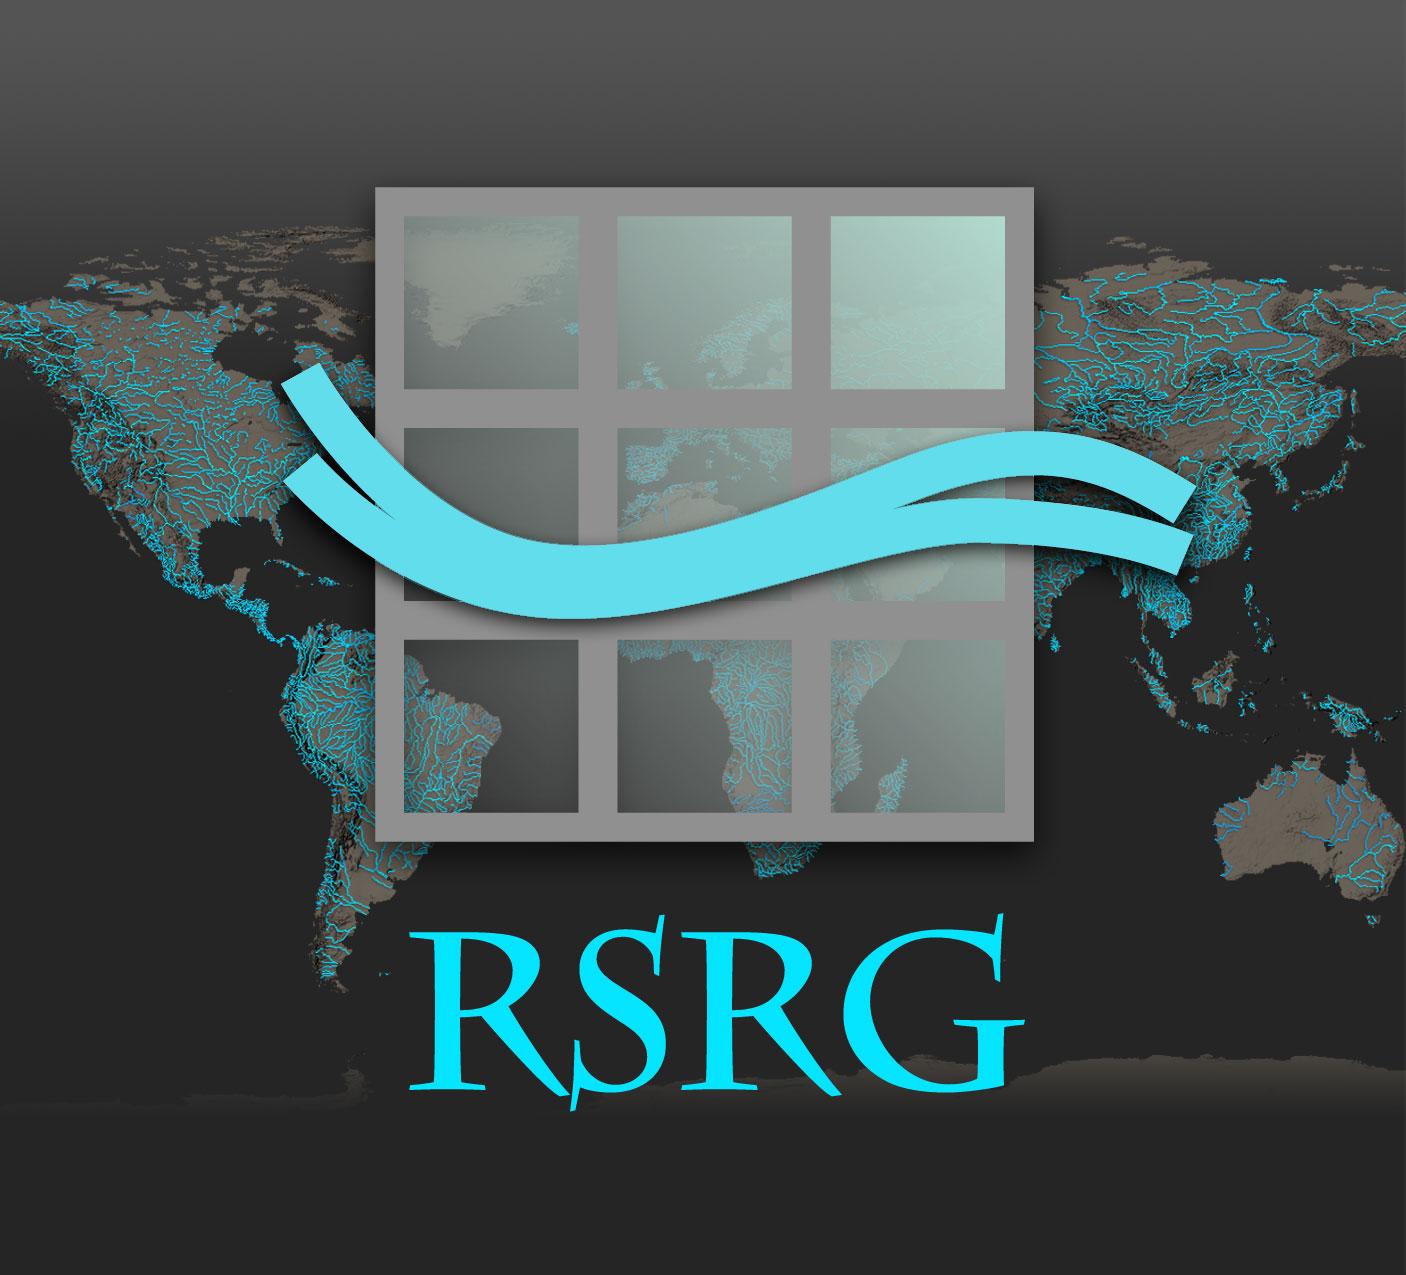 rsrg logo